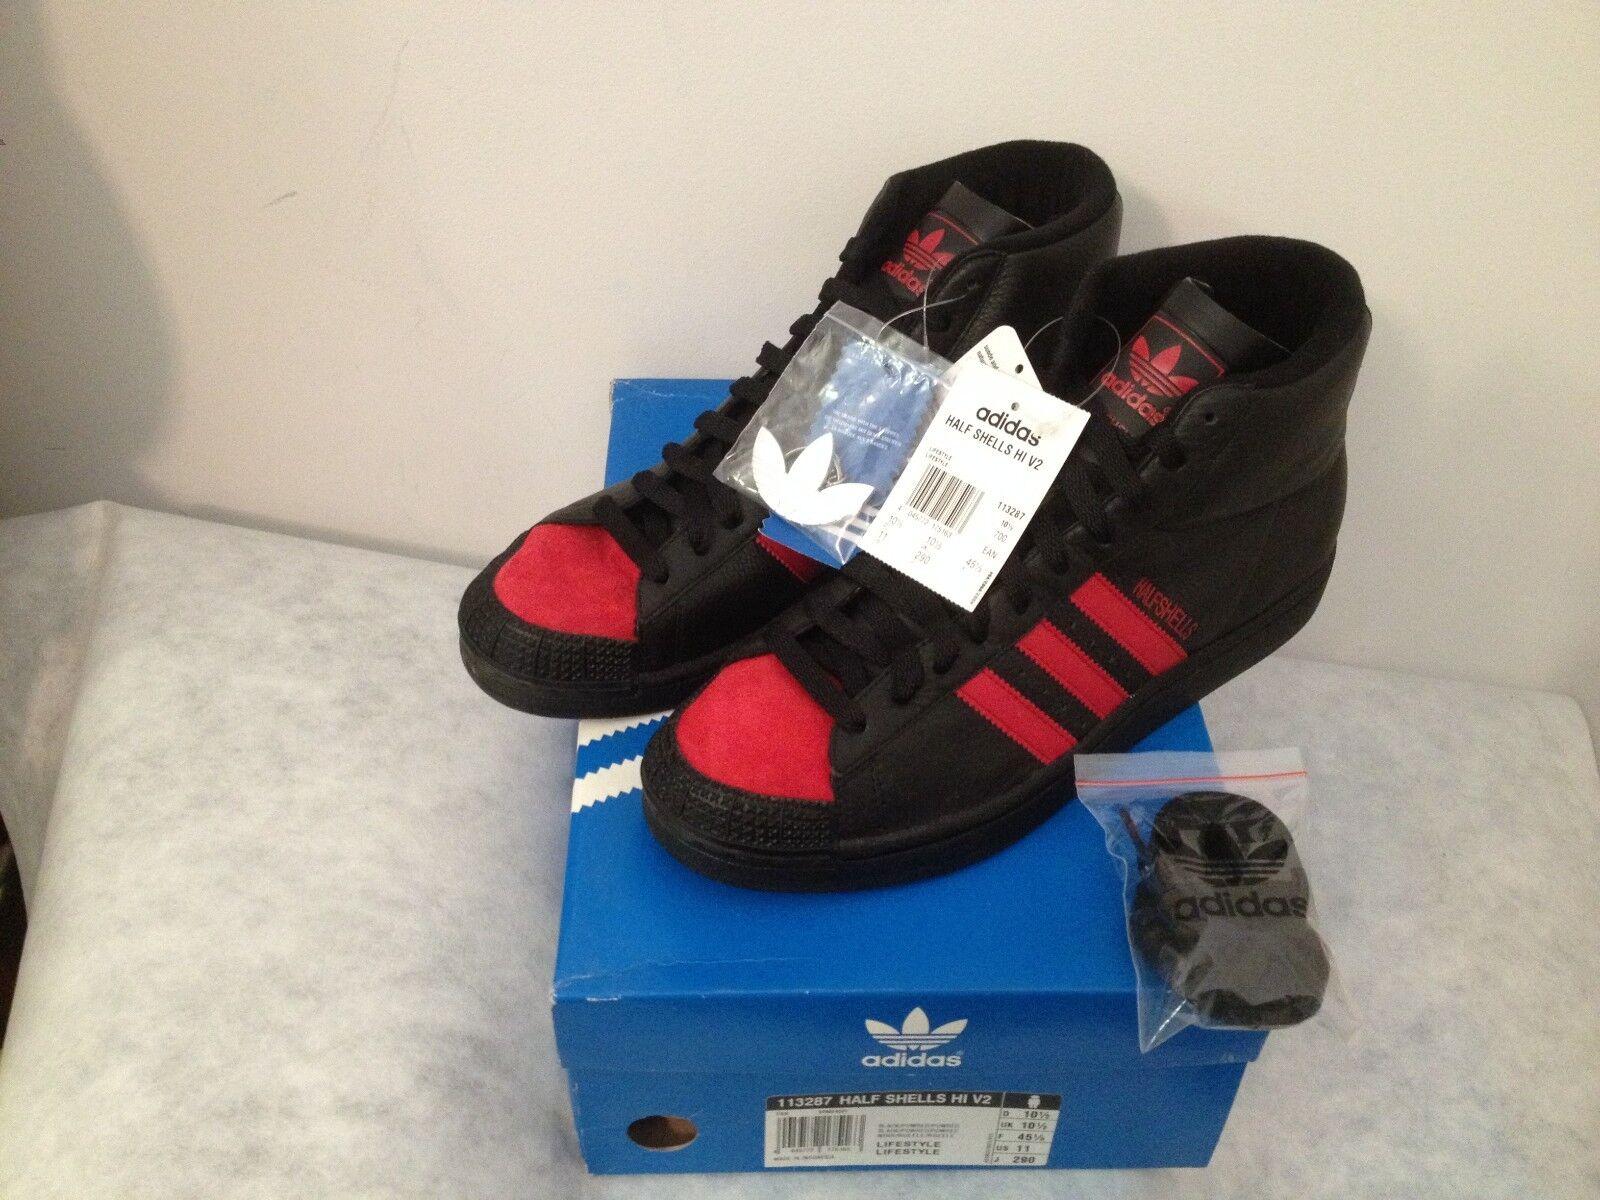 Adidas Half Shells Hi V2 in 45 1 3 UK 10.5 US 11 BNWT 113287 HALFSHELLS 06 2005